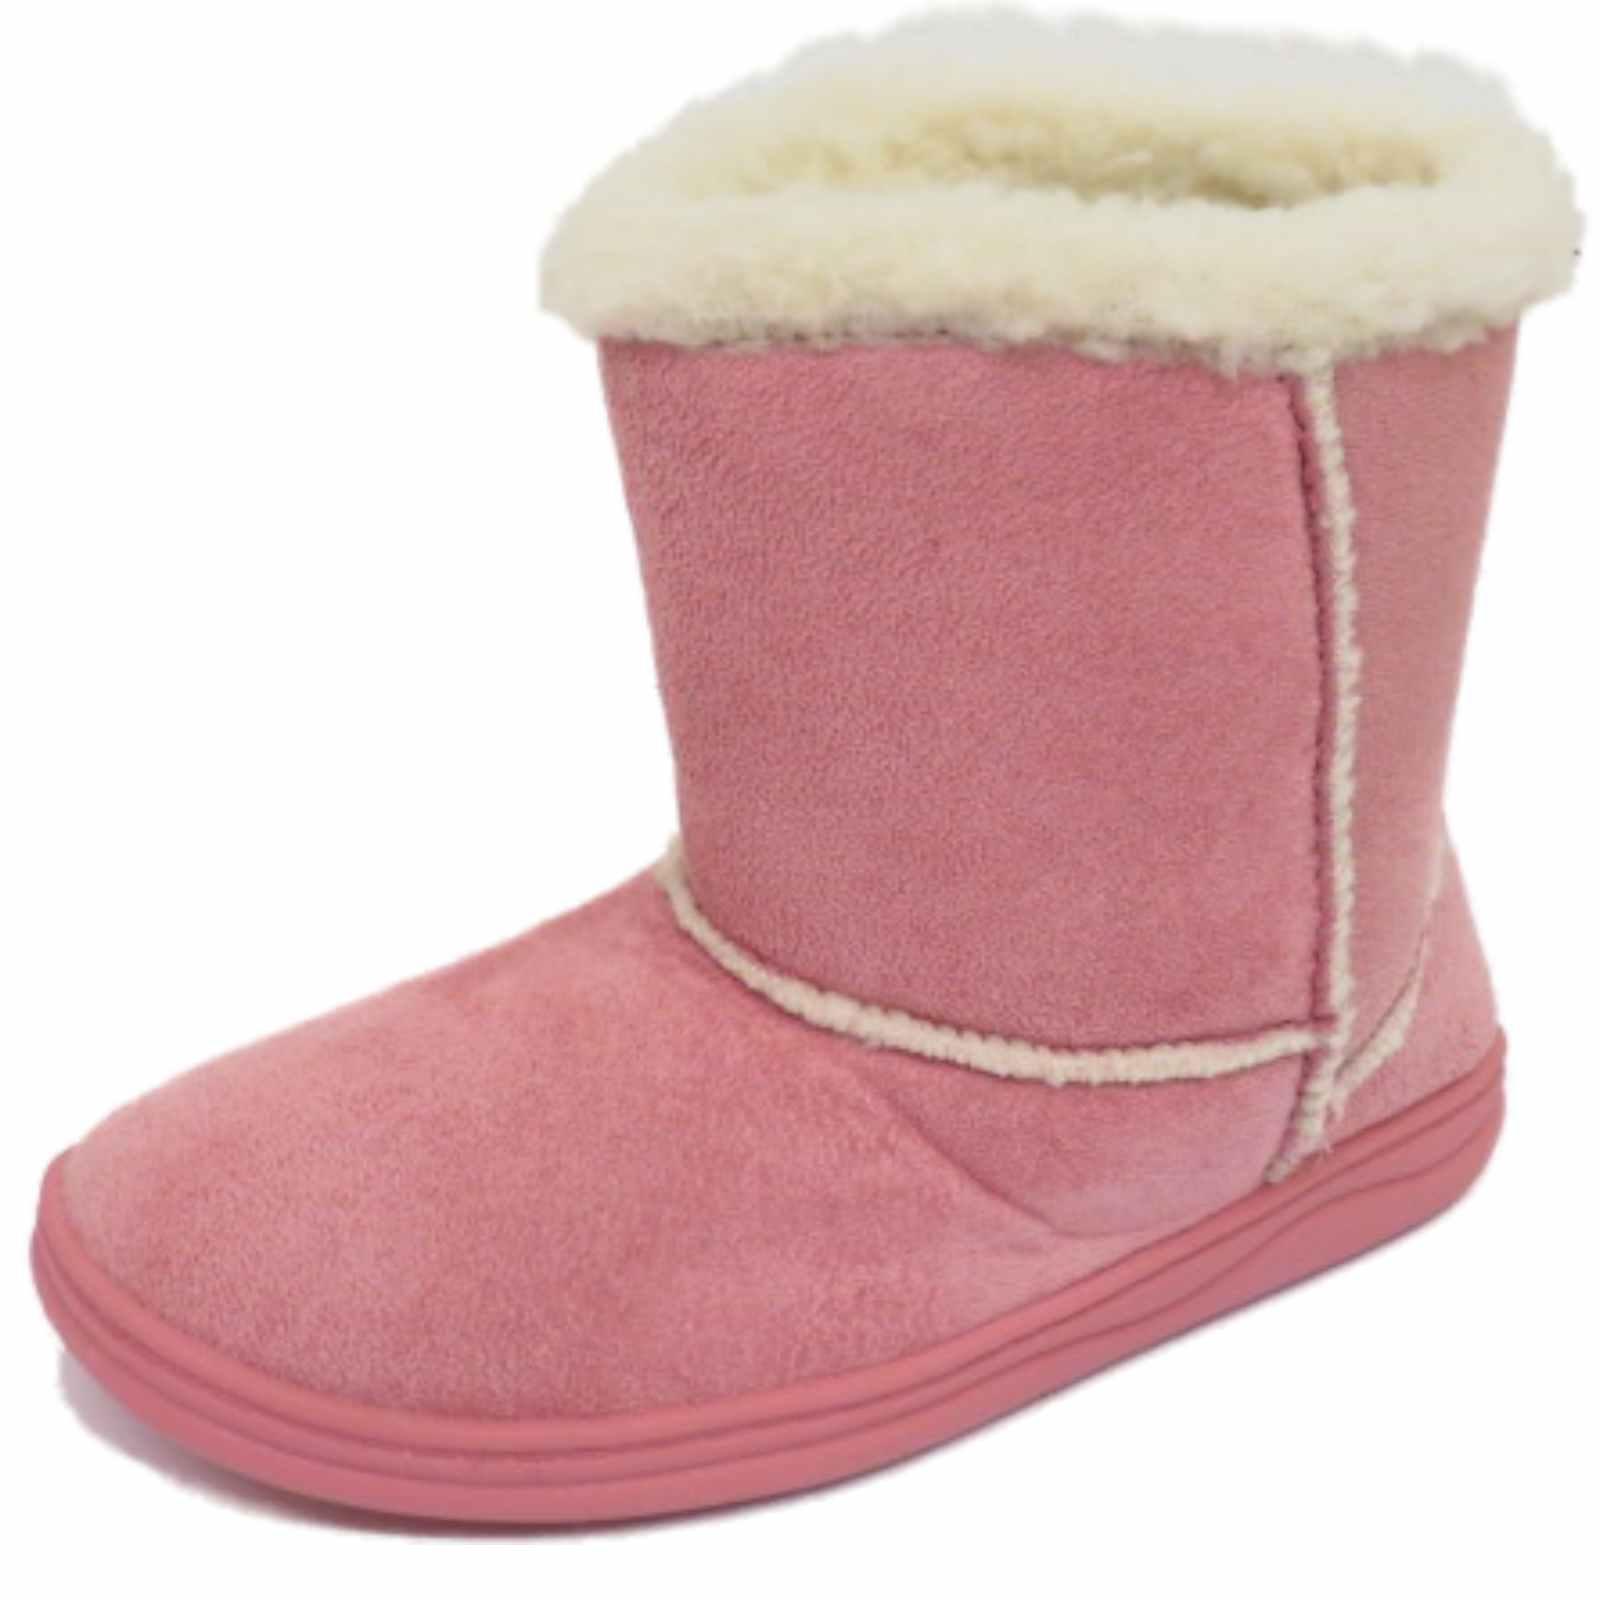 GIRLS NEW KIDS WARM WINTER FAUX FUR LINED SNUGG INFANTS CHILDREN SCHOOL BOOTS SZ